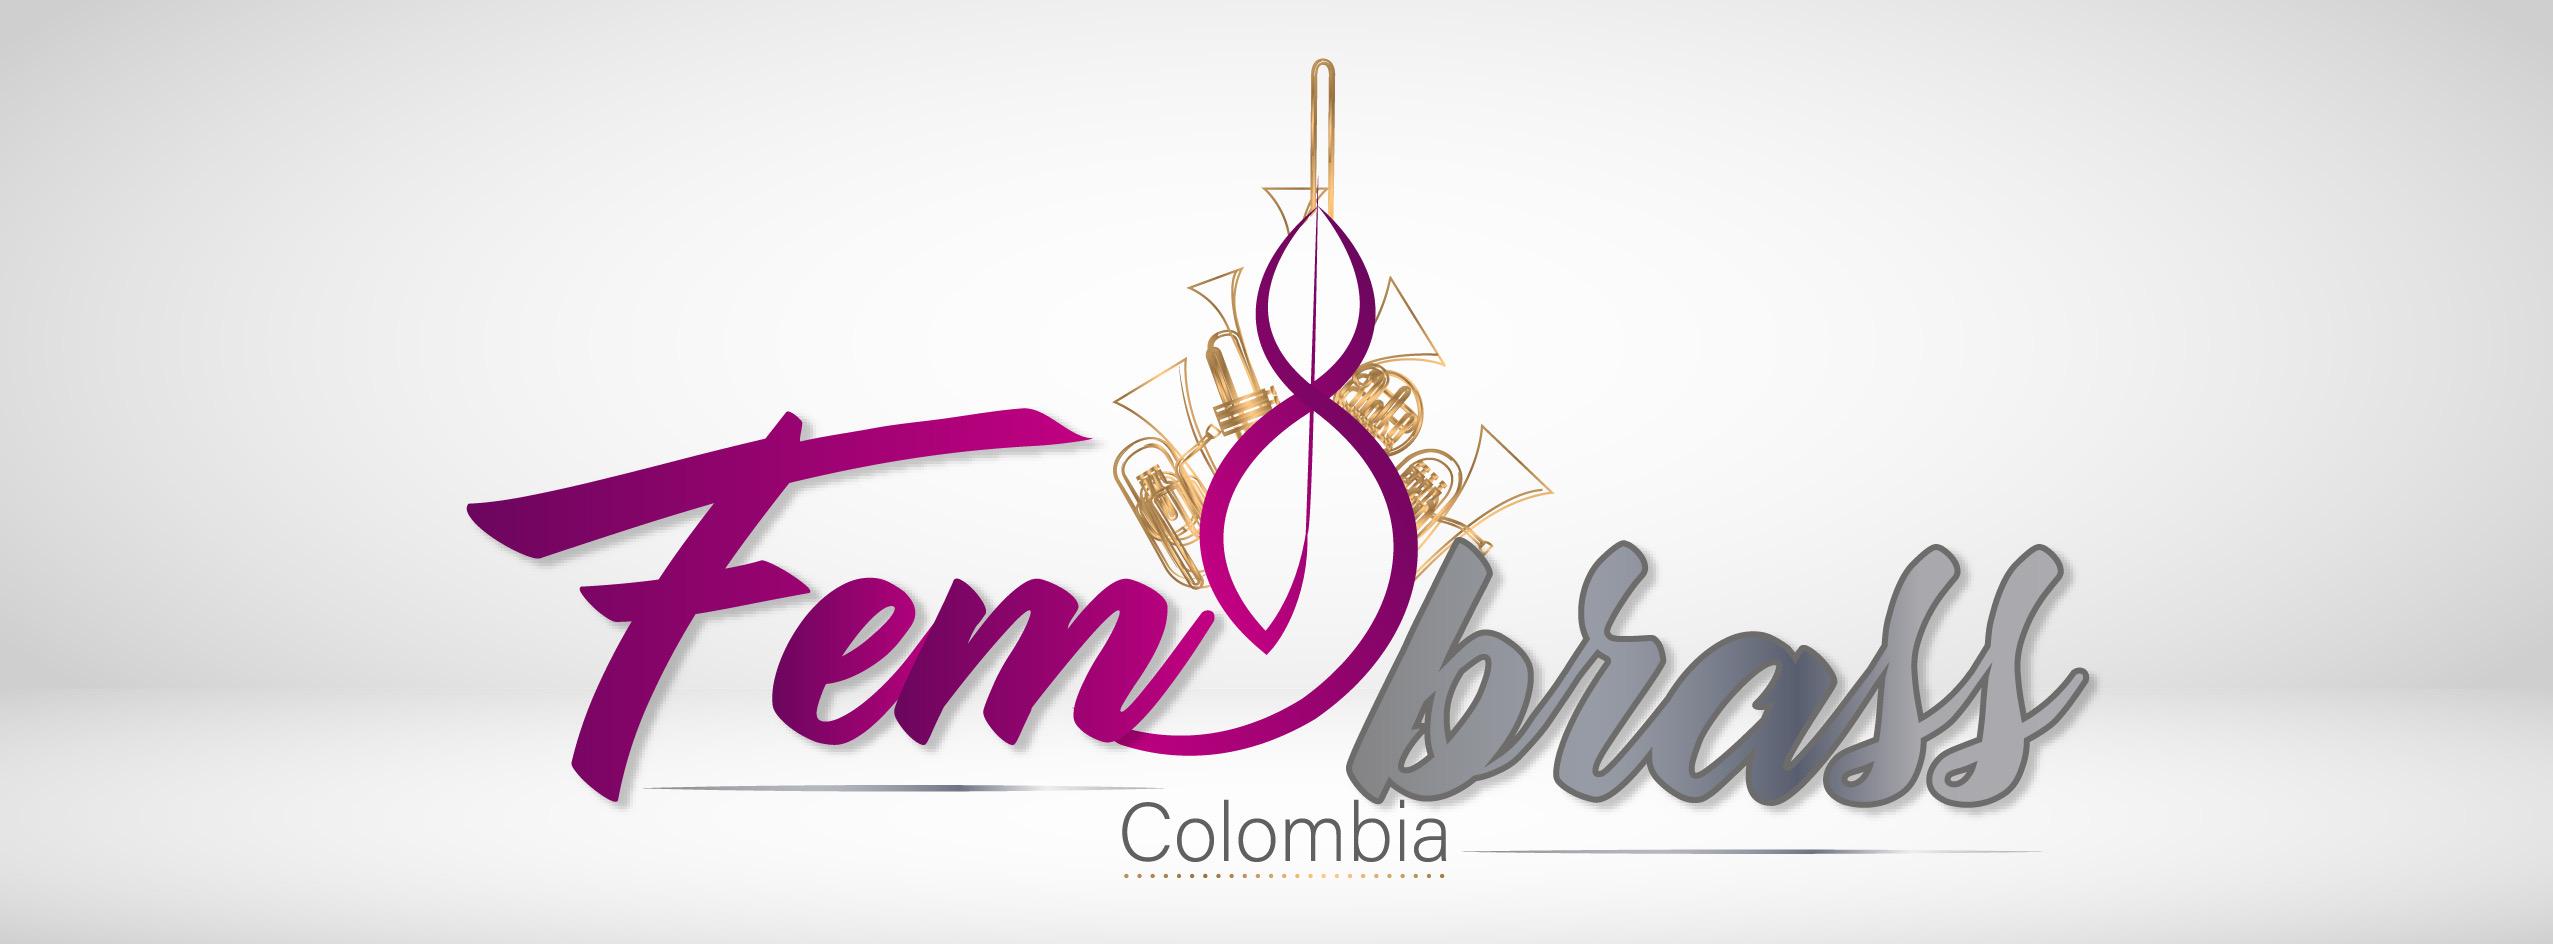 Logo Fembrass (Crédito: Carol Echeverry)